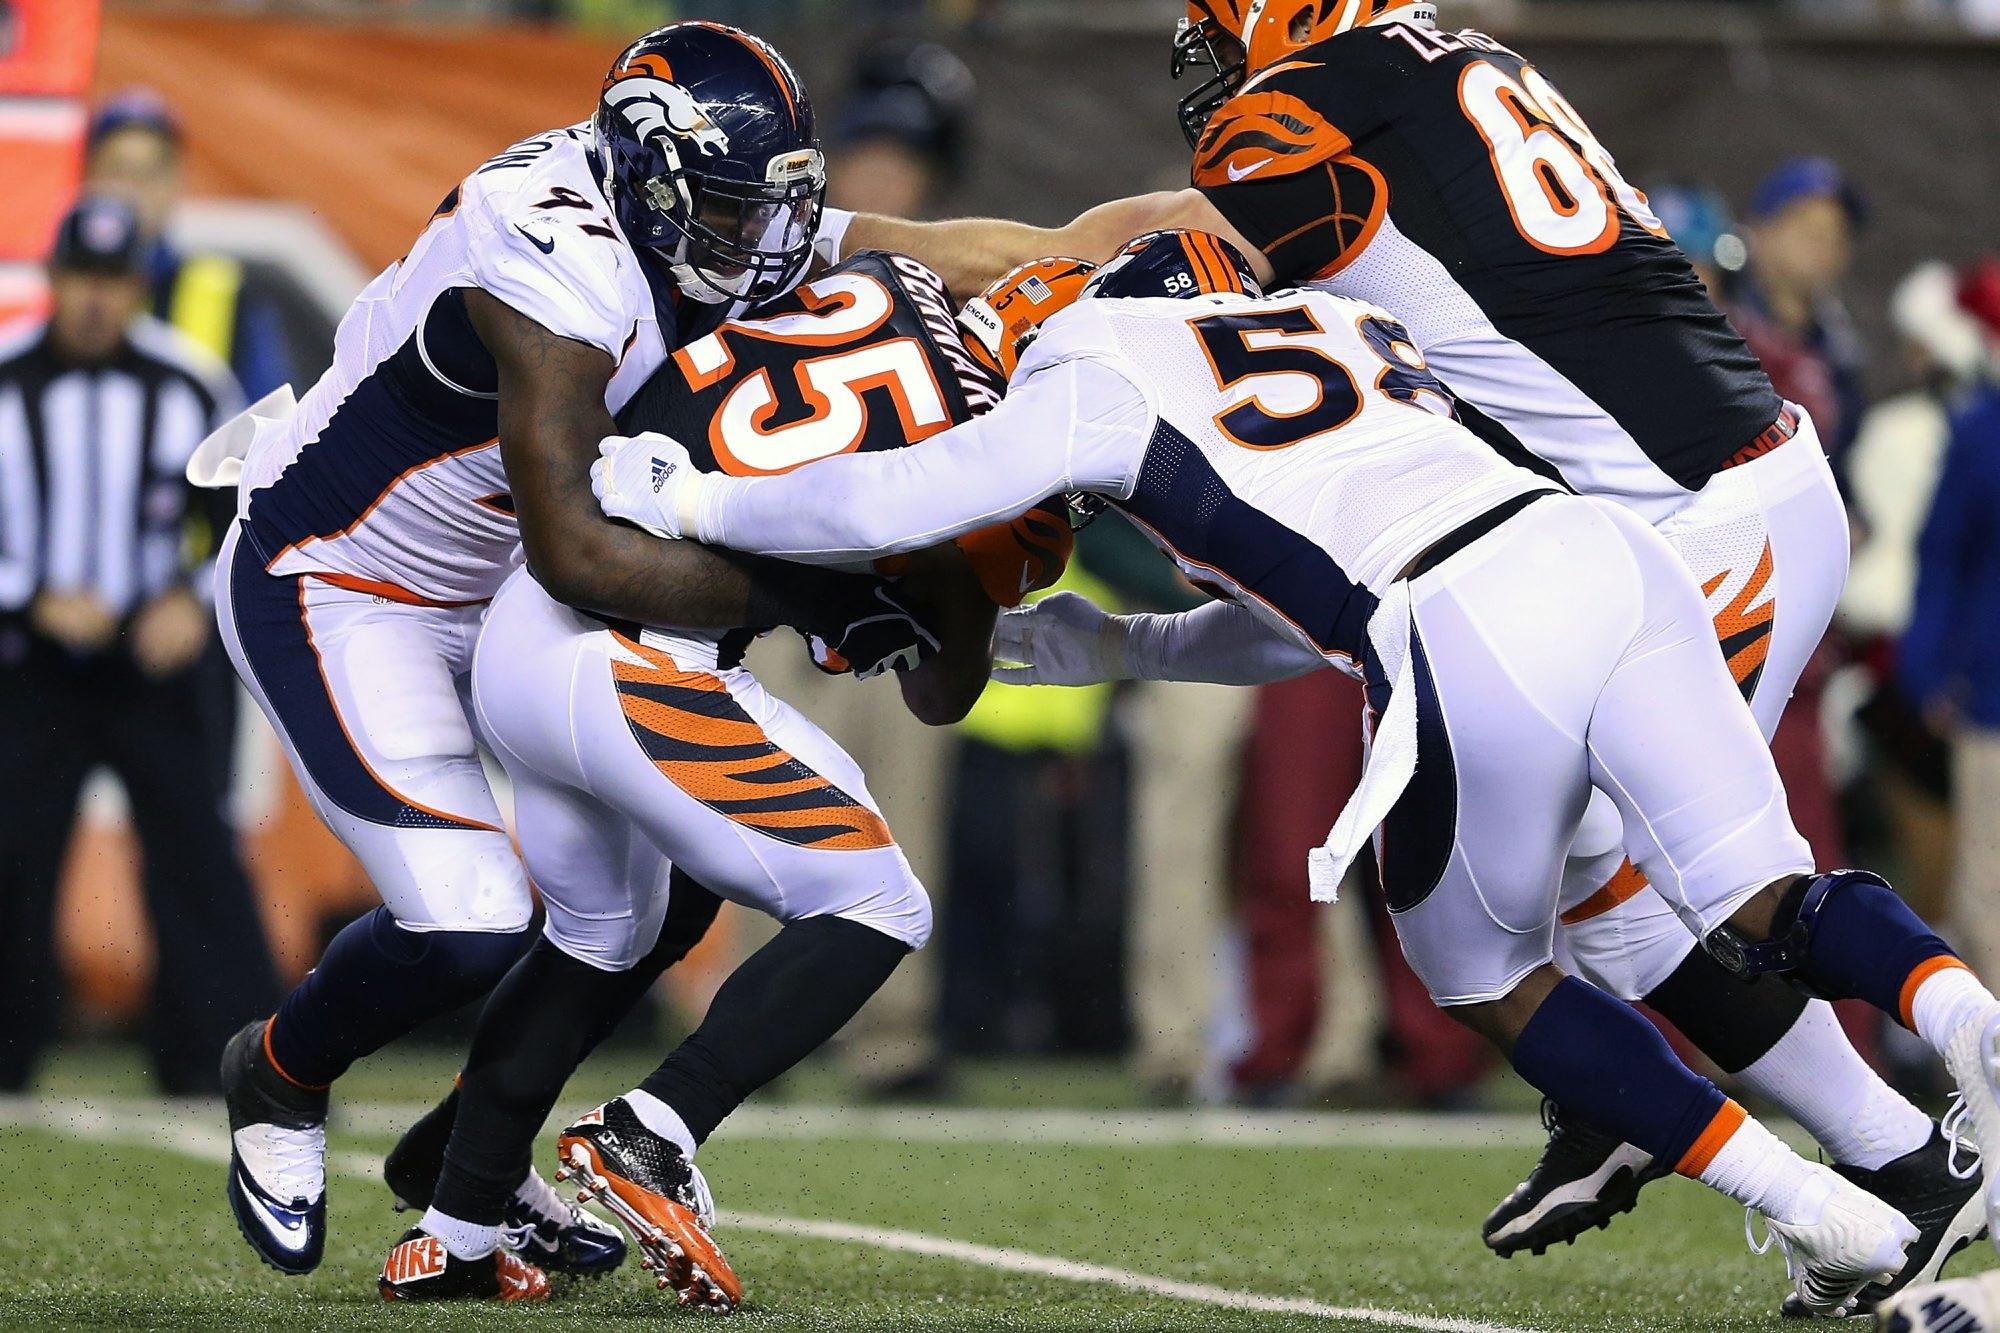 Denver defenders Malik Jackson and Von Miller team up to tackle Cincinnati's Giovani Bernard during last year's meeting between the teams at Paul Brown Stadium. The Broncos and Bengals meet again in Denver Monday night.